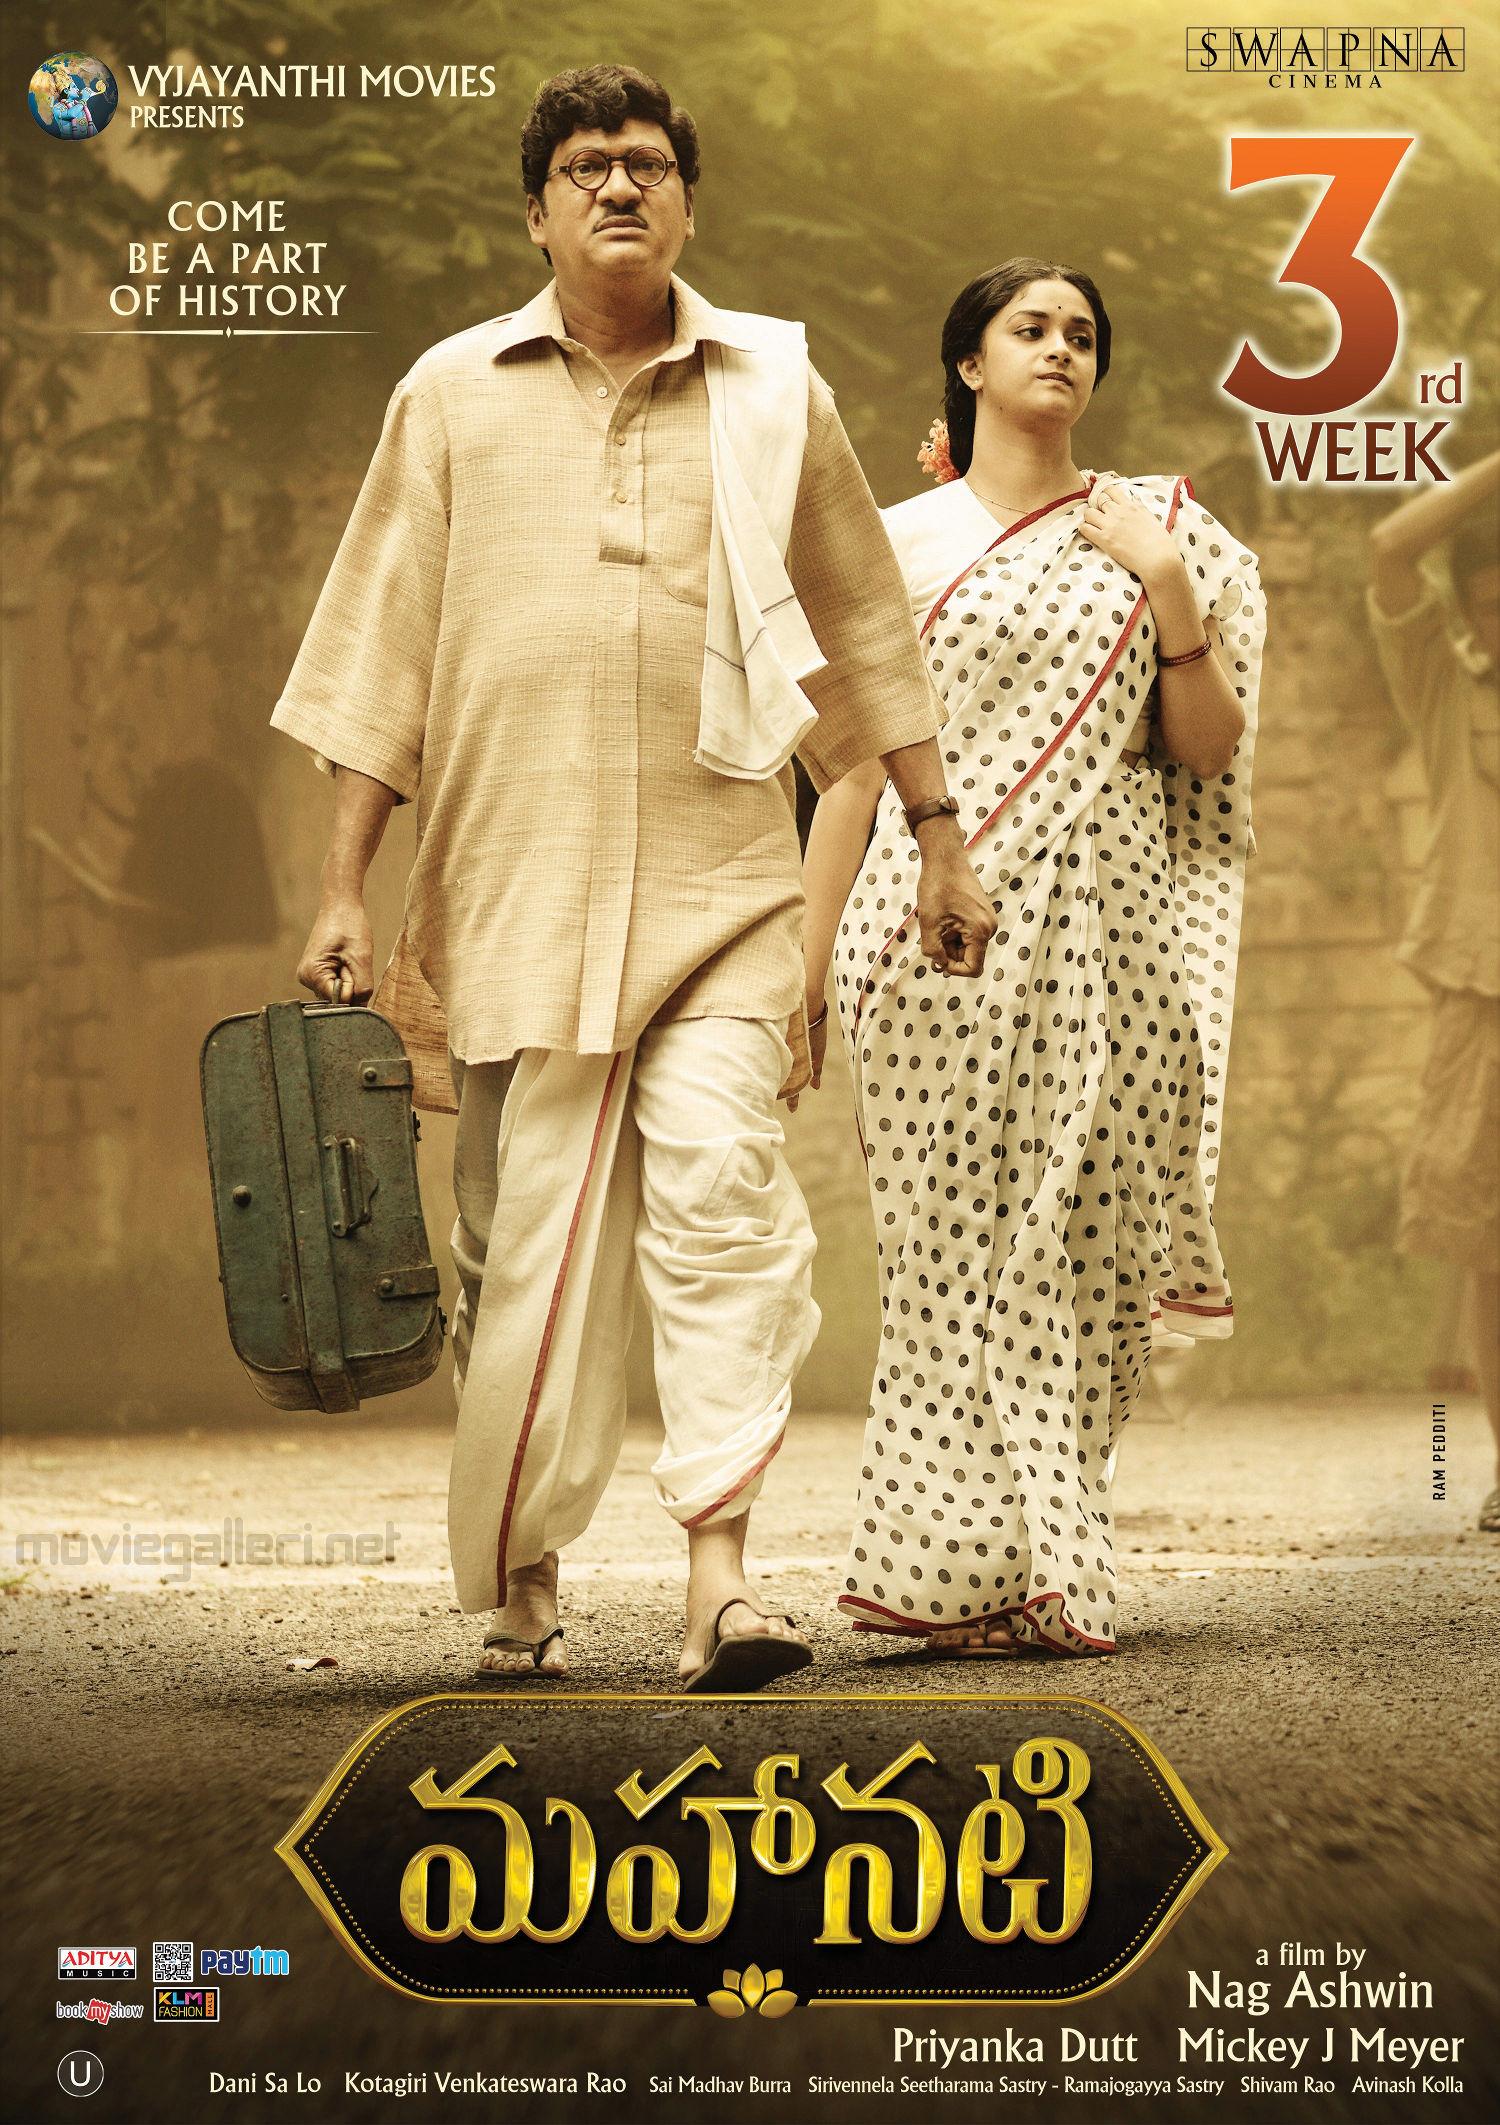 Rajendra Prasad, Keerthy Suresh in Mahanati Movie 3rd Week Poster HD